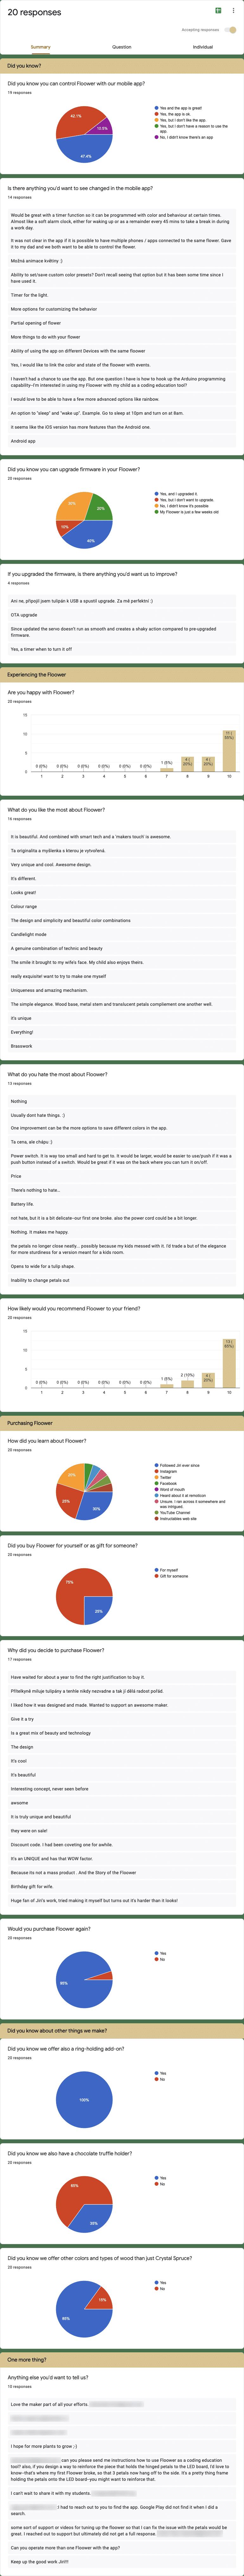 Floower survey results